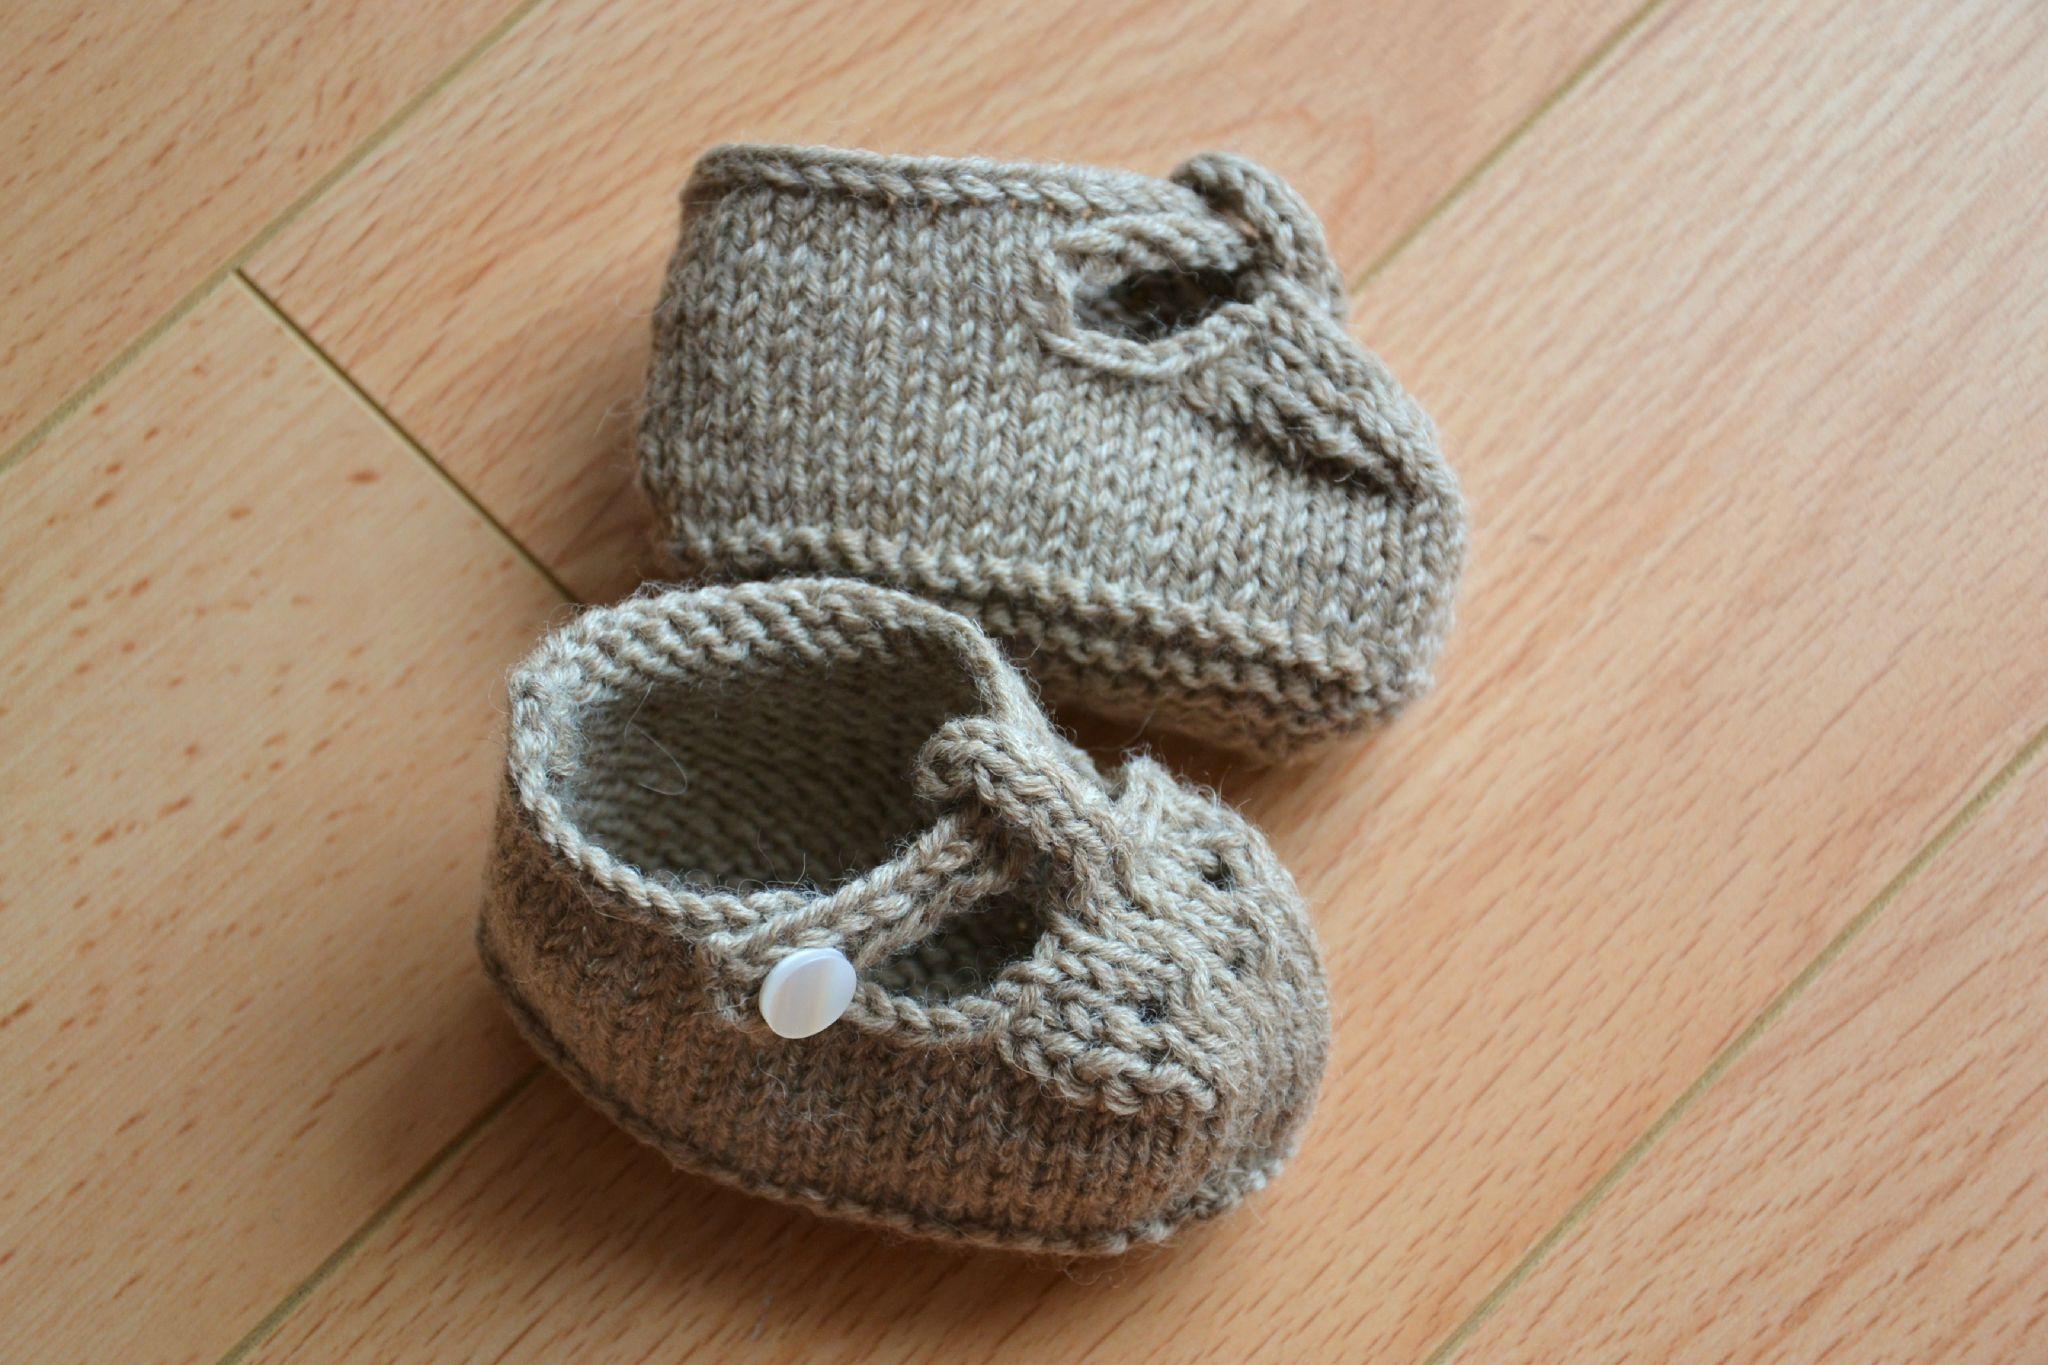 Crochet et tricot - Page 6 78000736_o